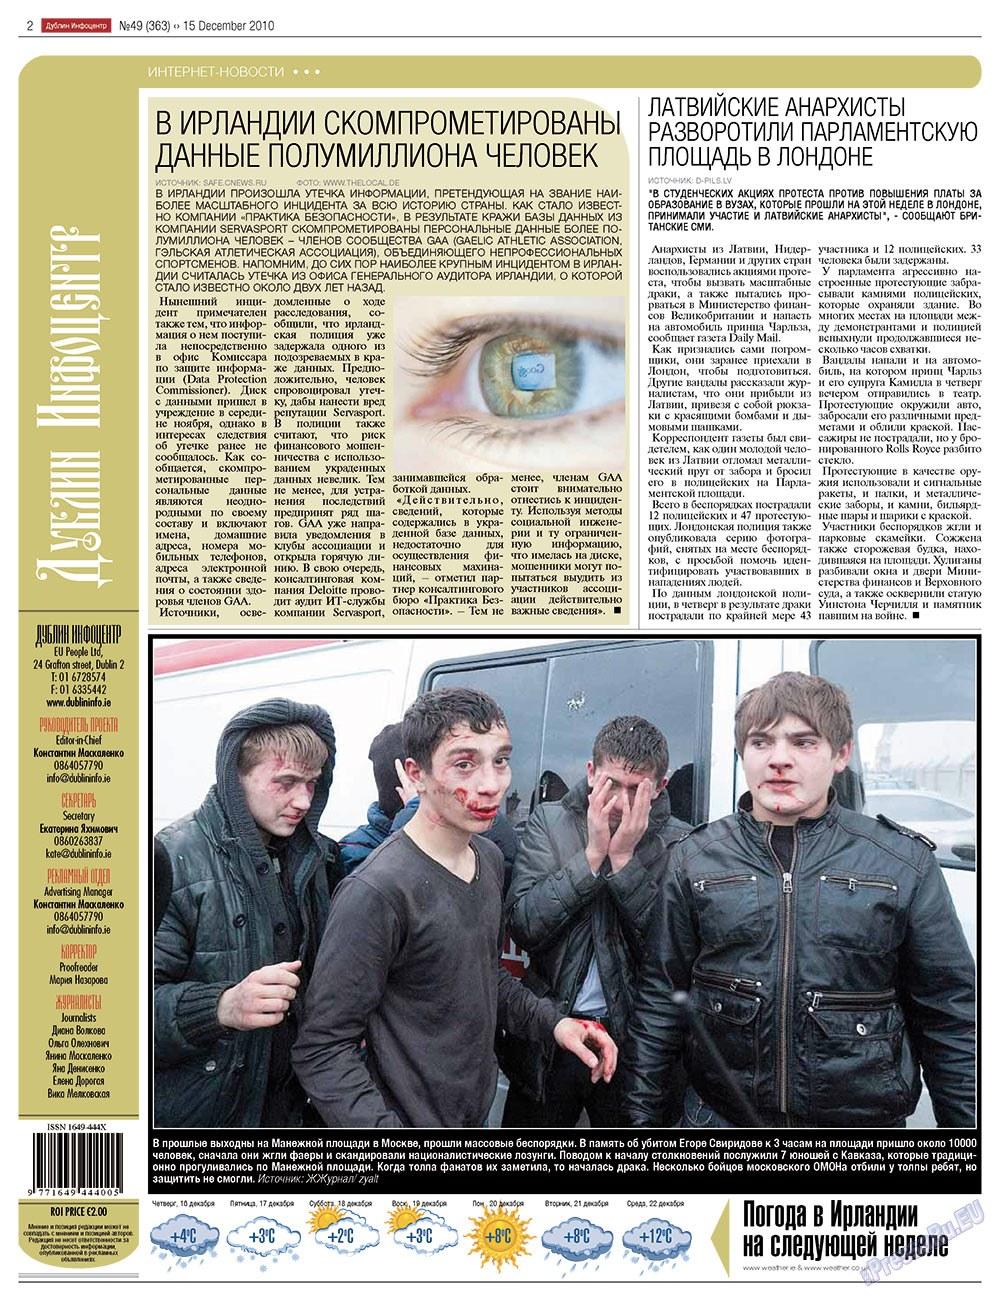 Дублин инфоцентр (газета). 2010 год, номер 49, стр. 2